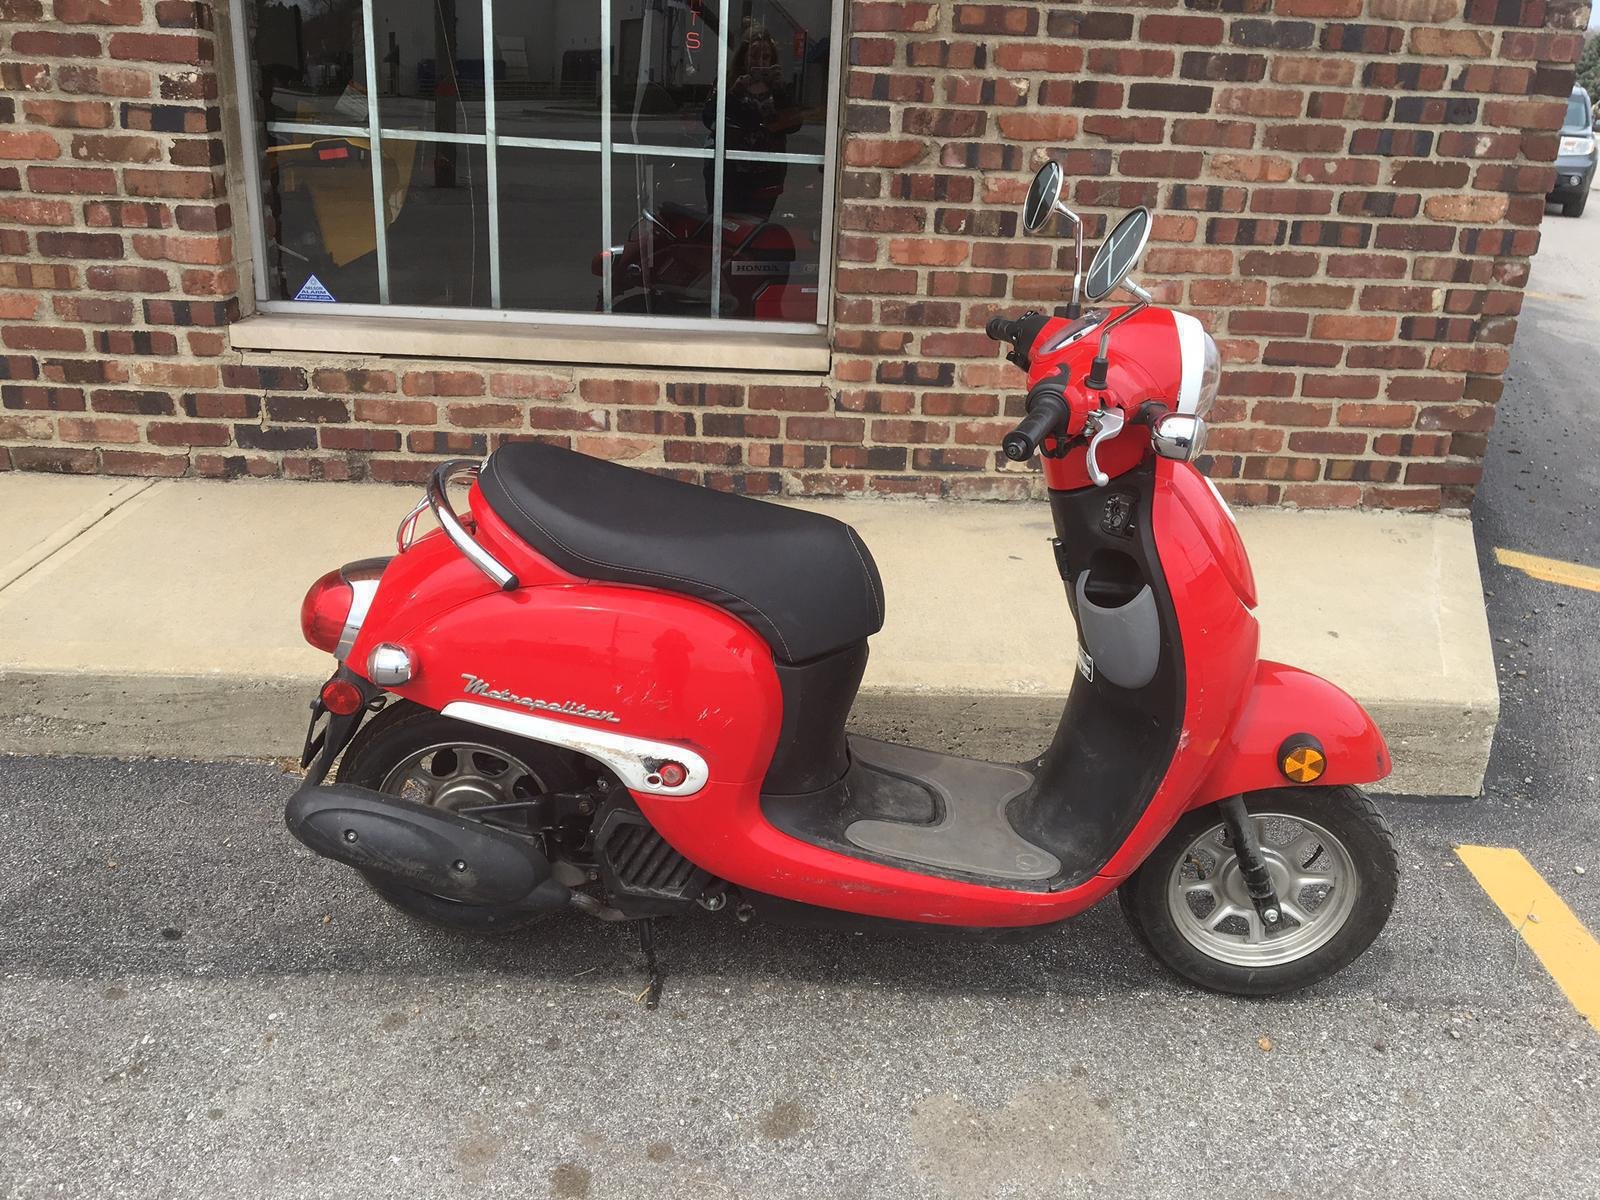 2016 Honda METROPOLITAN for sale in Indianapolis IN